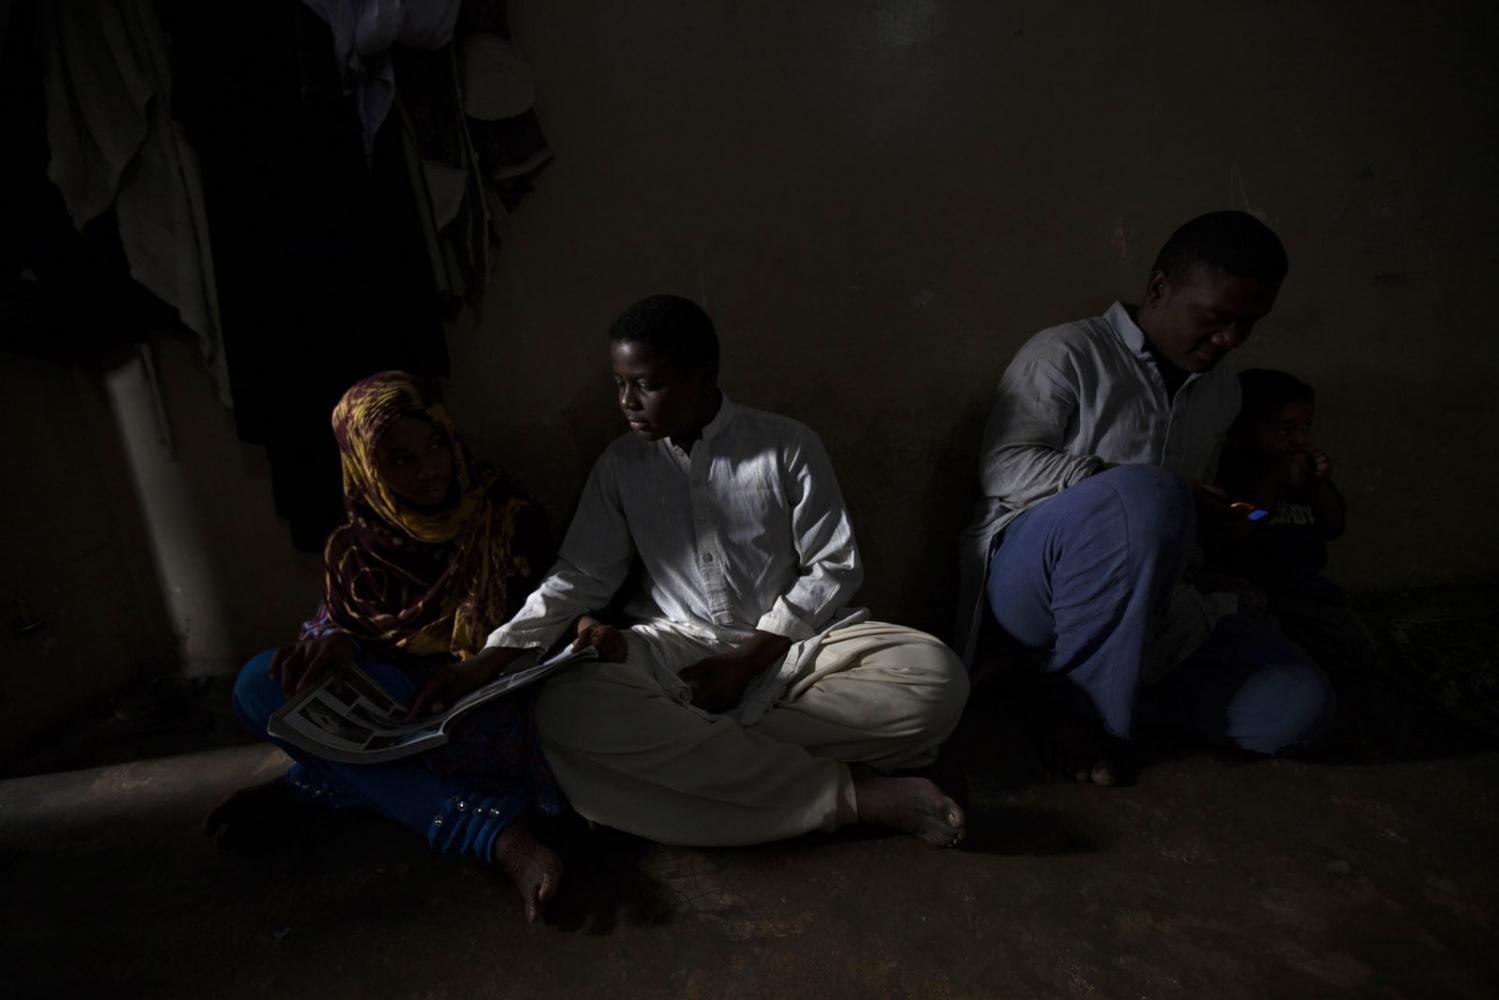 Art and Documentary Photography - Loading Sidi_SouthAsia07.JPG